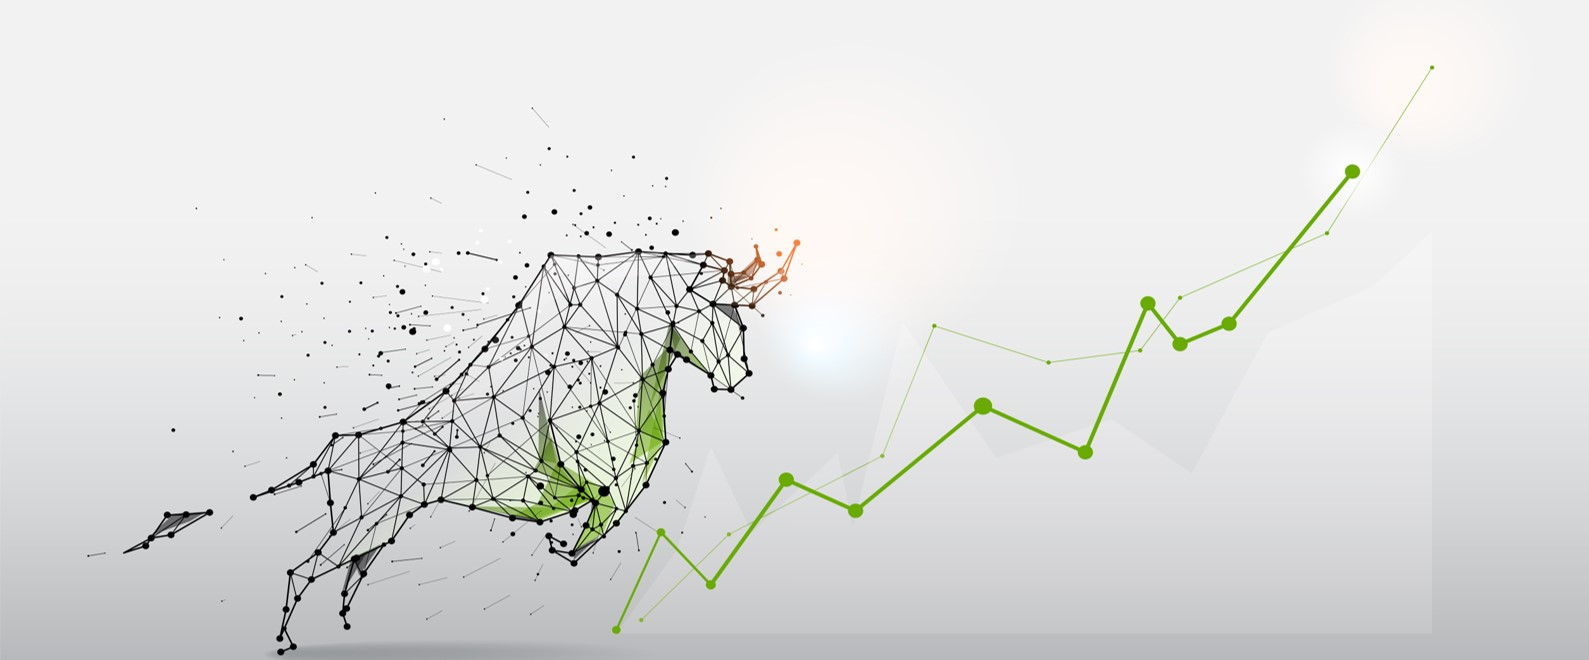 best-technology-stocks-buy-today